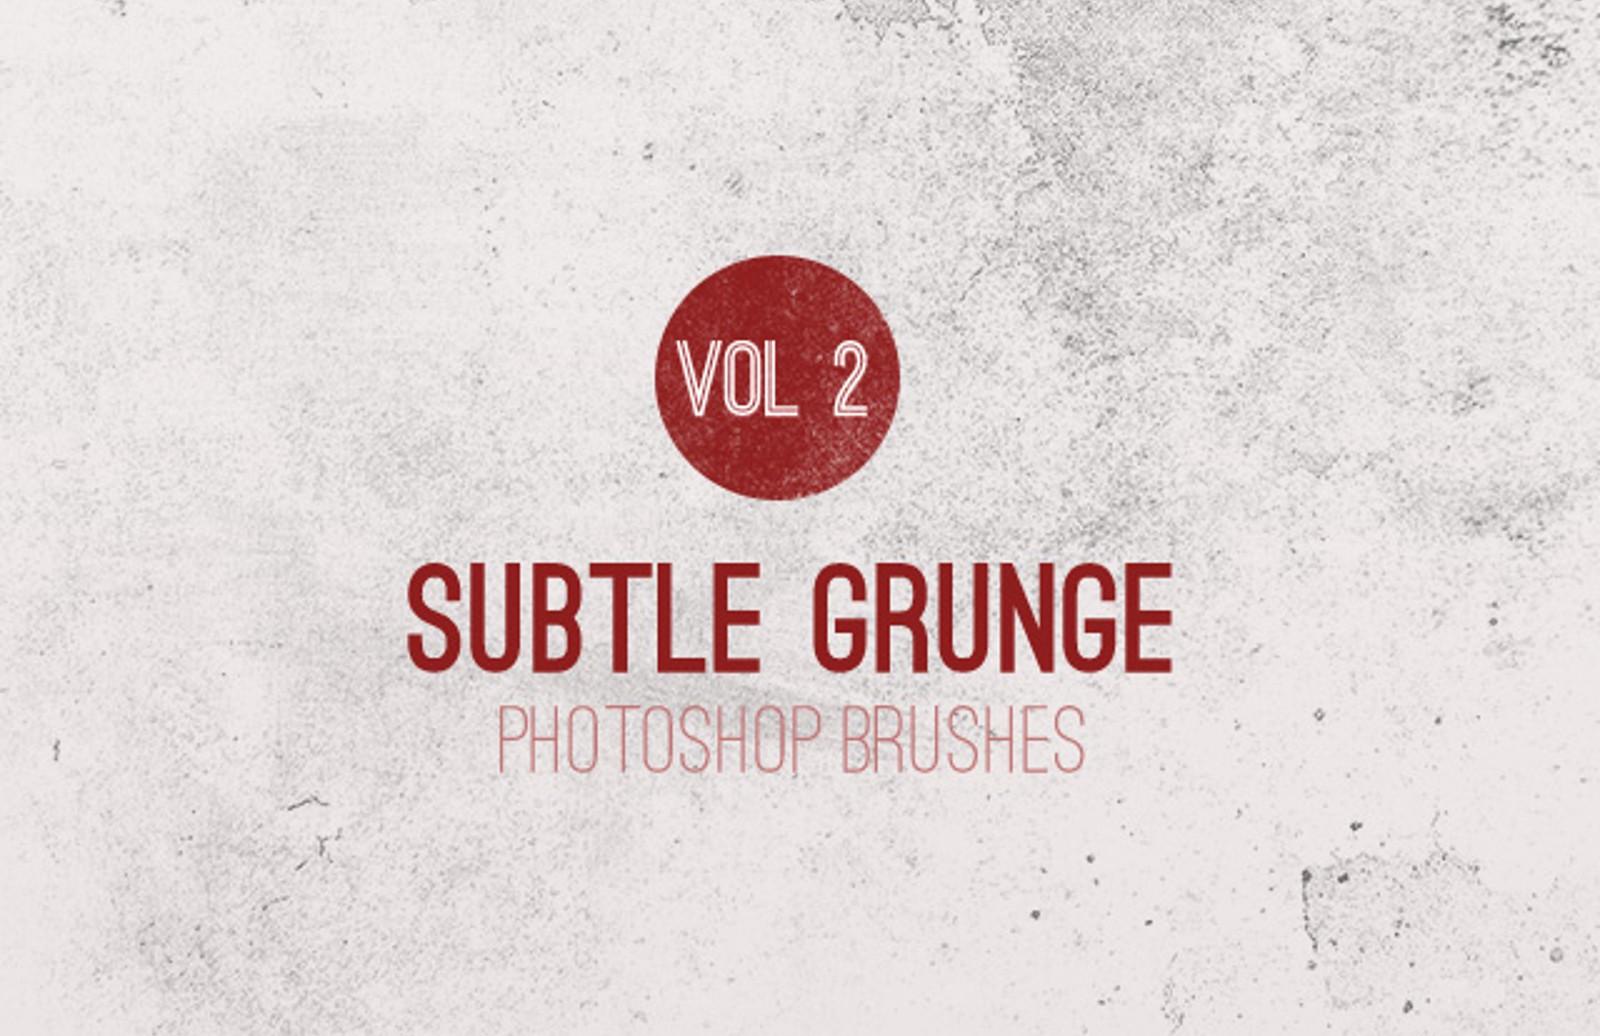 Subtle  Grunge  Brushes  Vol 2  Preview1